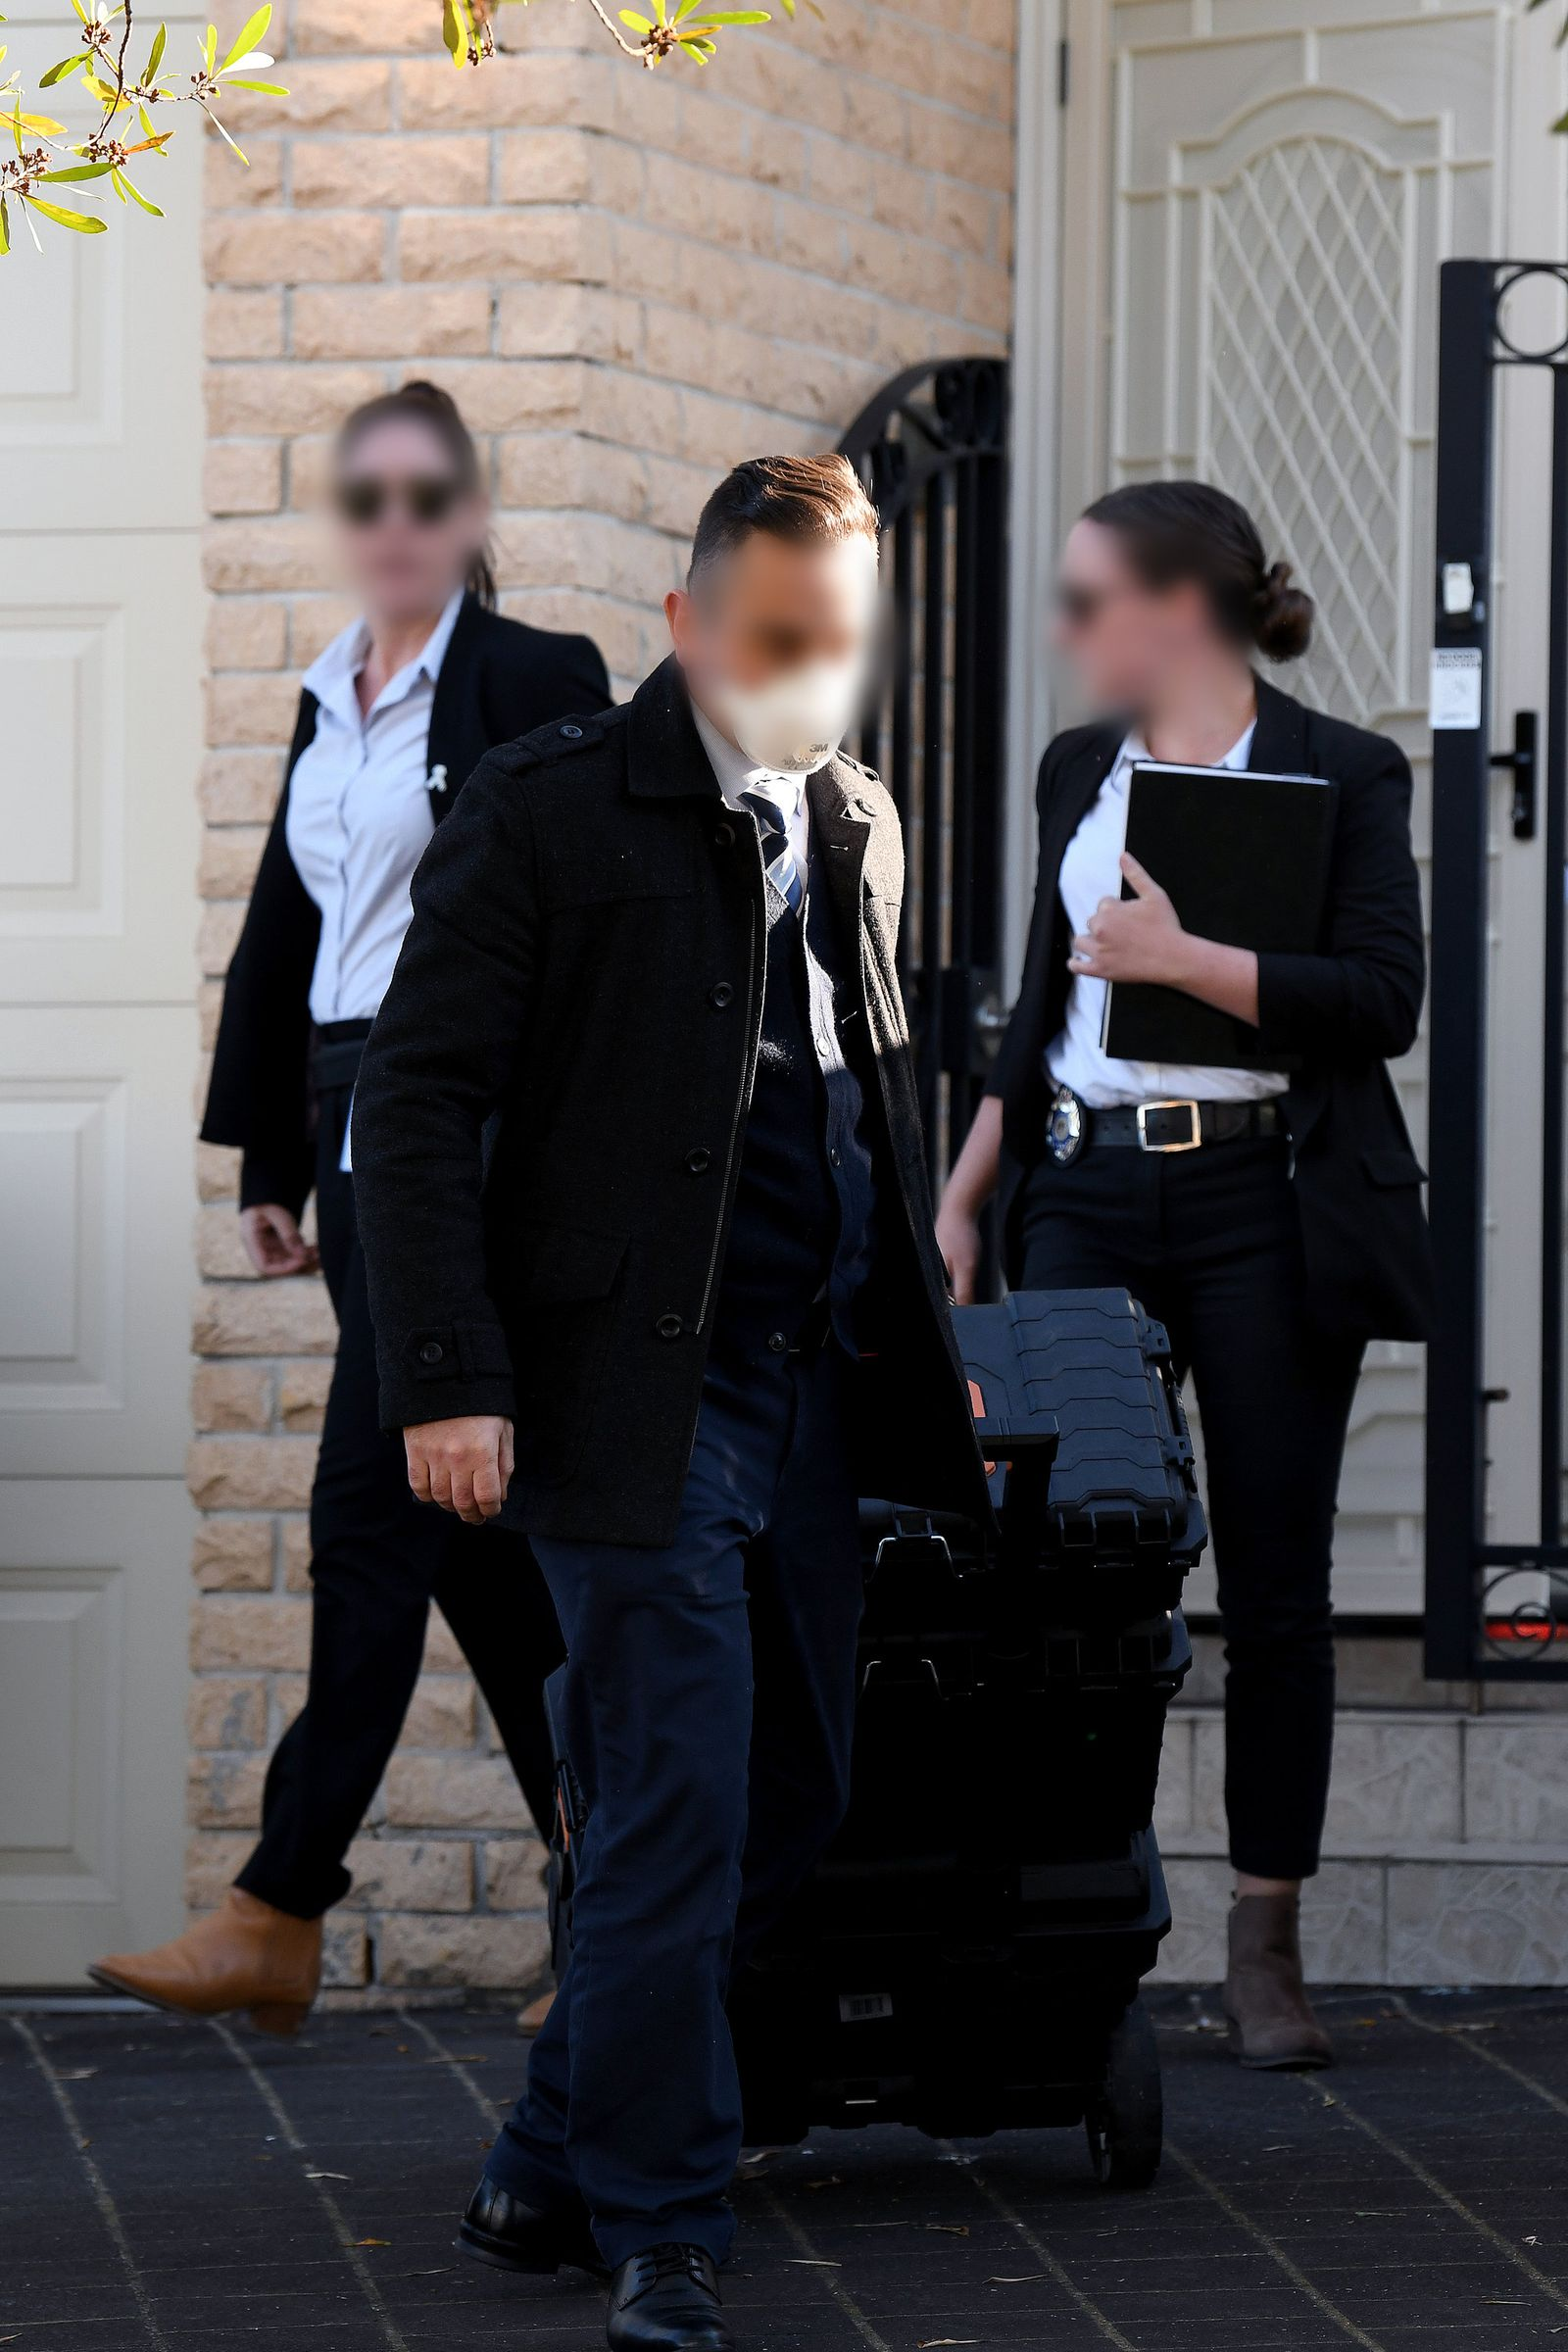 NSW LABOR MP SHAOQUETT MOSELMANE RAIDS